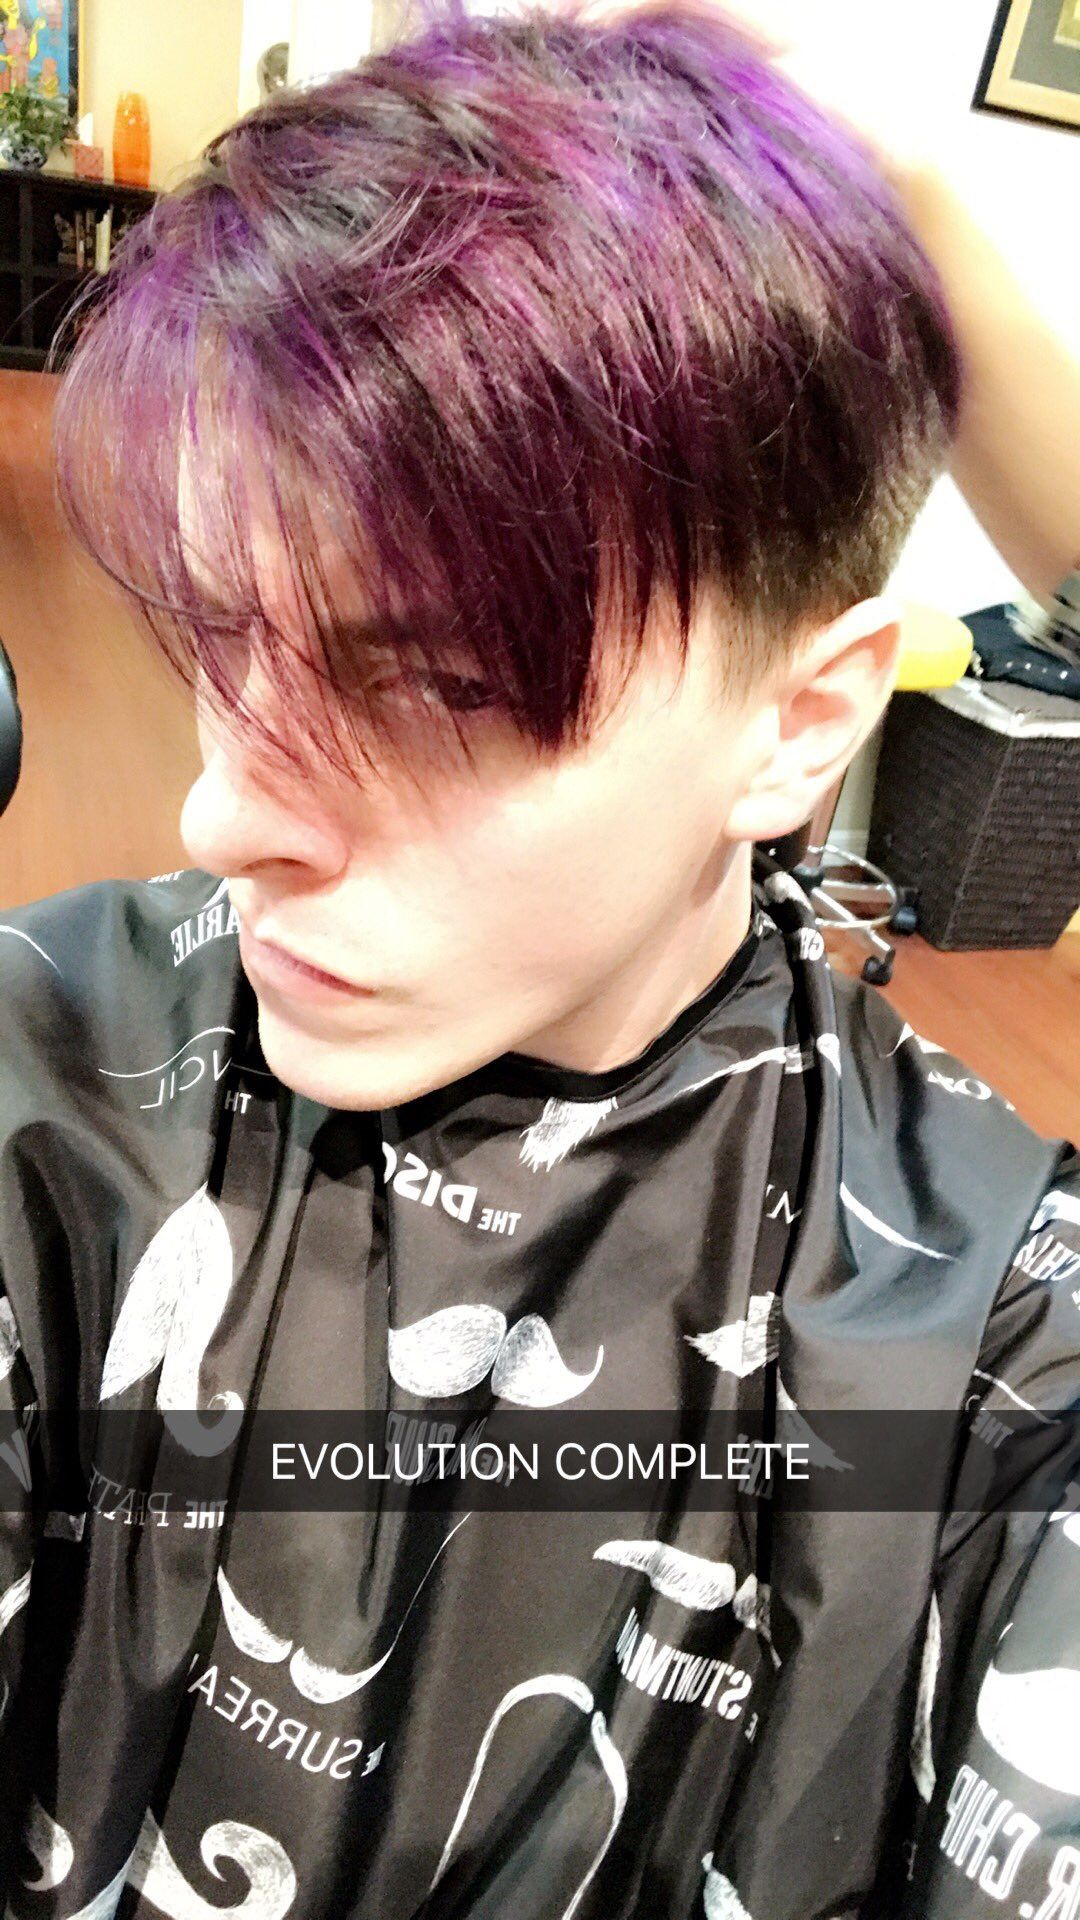 Thomas dyed his hair purple!!! << this pic screams virgil